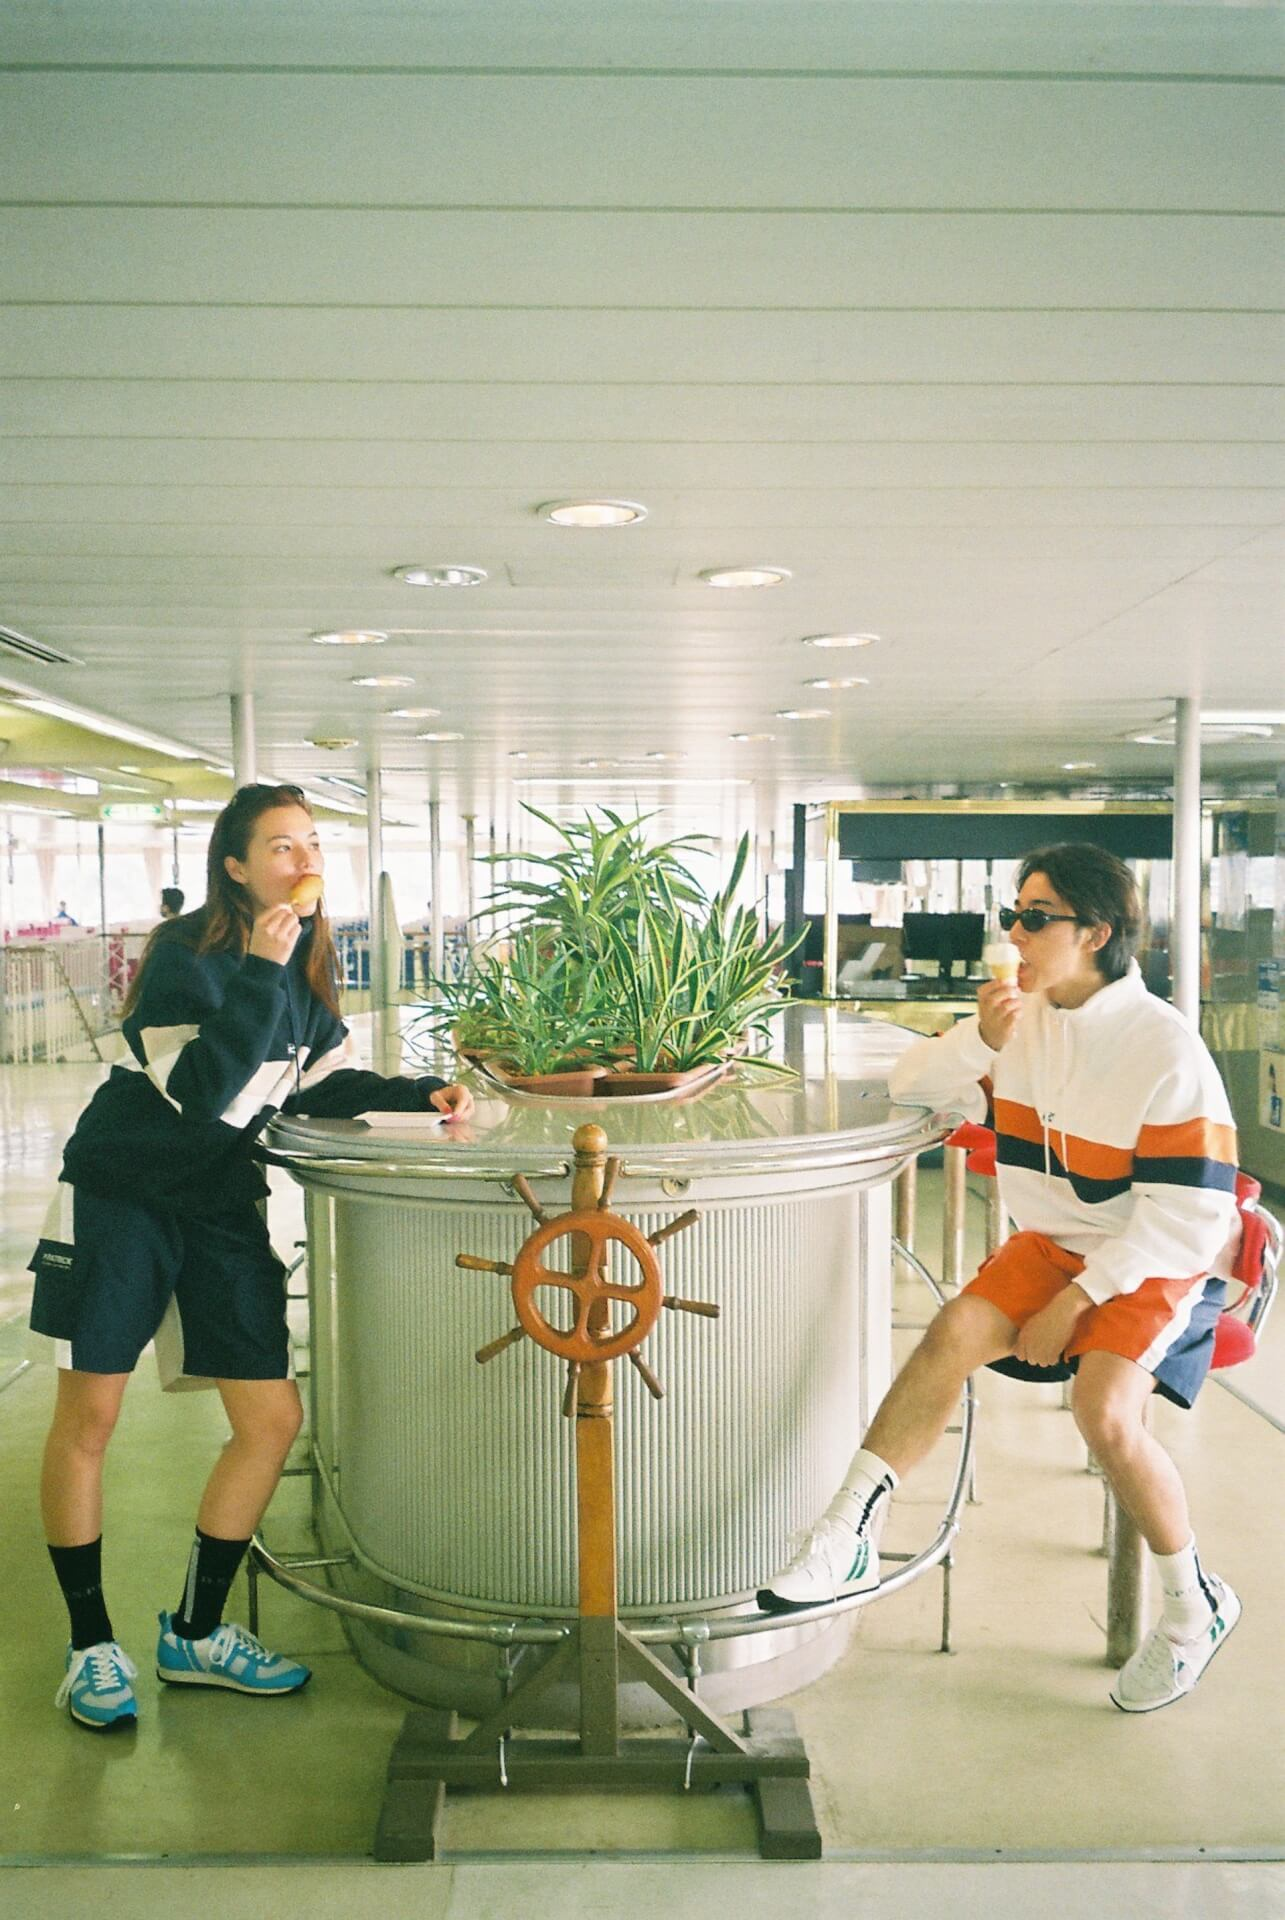 Diaspora skateboardsがフランス発祥のシューズブランド・PATRICKとのカプセルコレクションを明日販売開始! fashion210423_diasporaskateboards-03